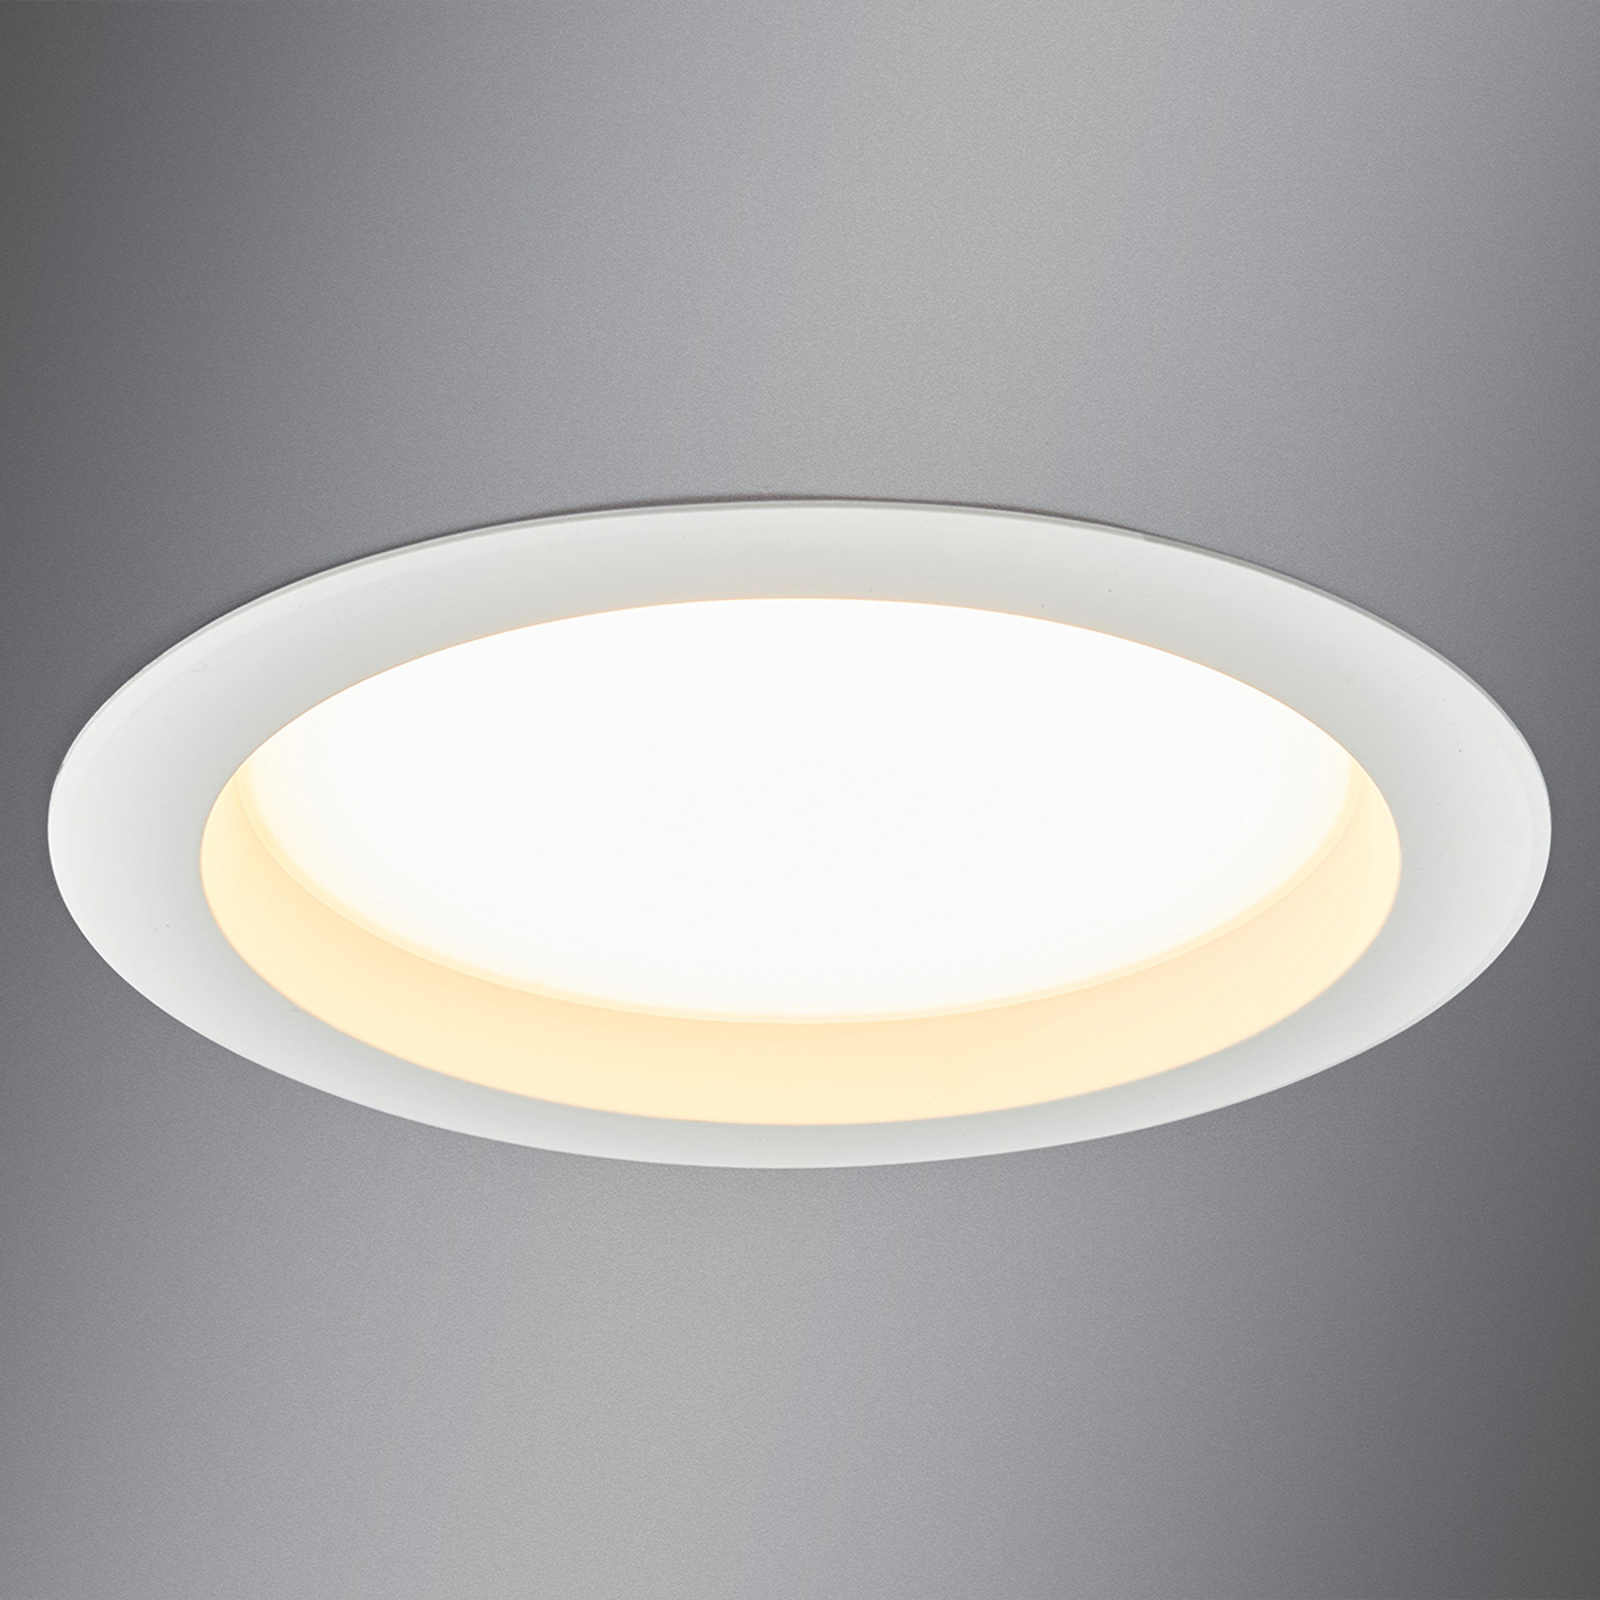 Grote LED inbouwspot Arian, 24,4 cm 22,5W